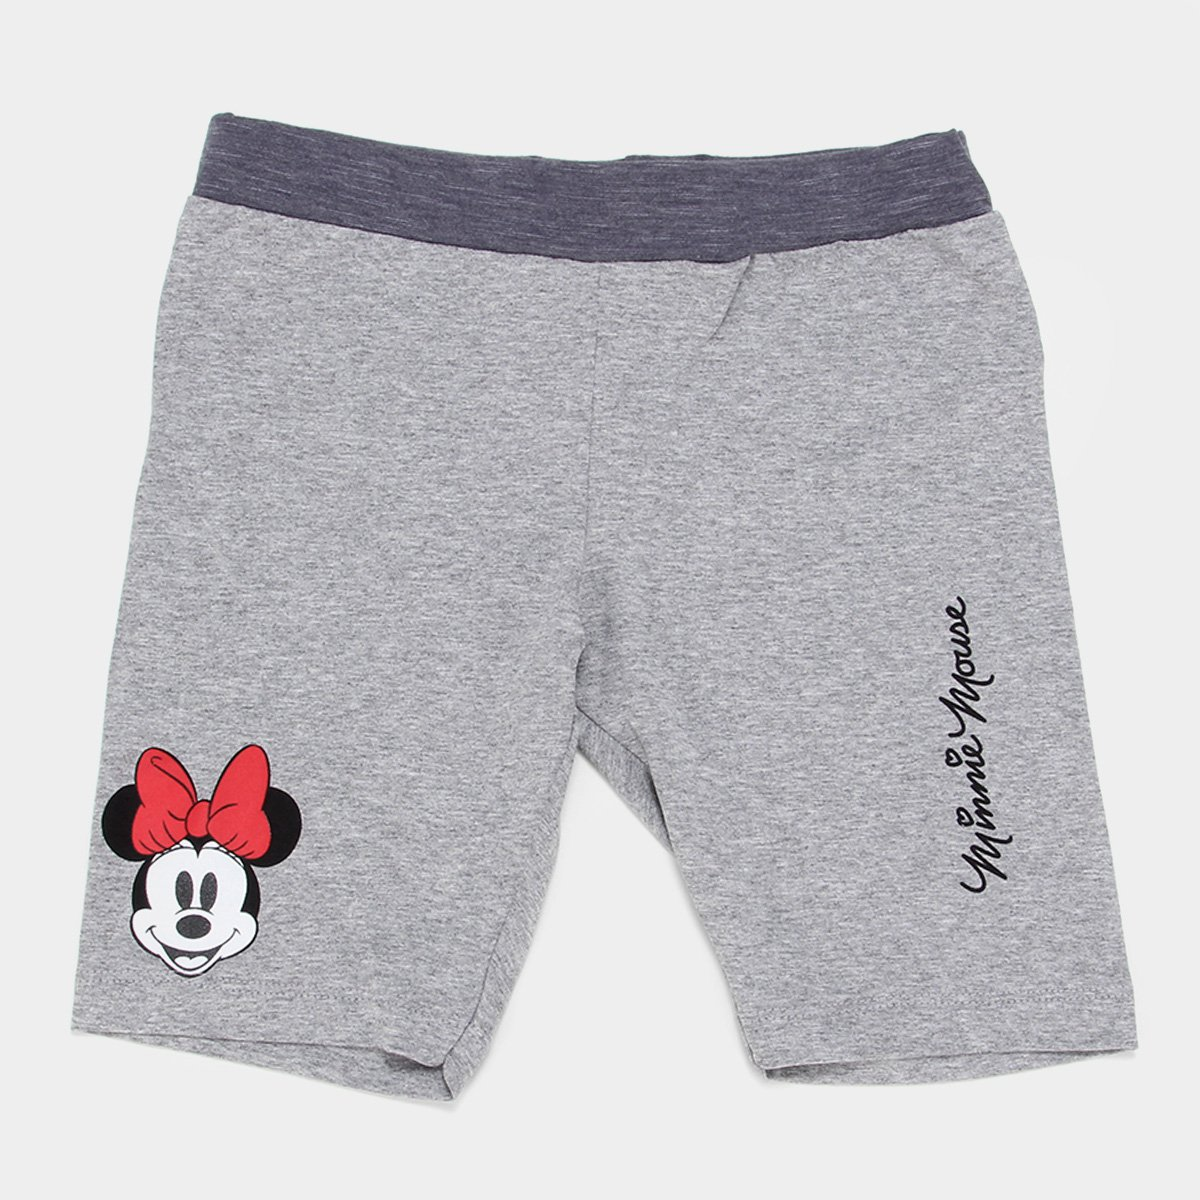 Shorts Infantil Disney Minnie Mouse Feminino